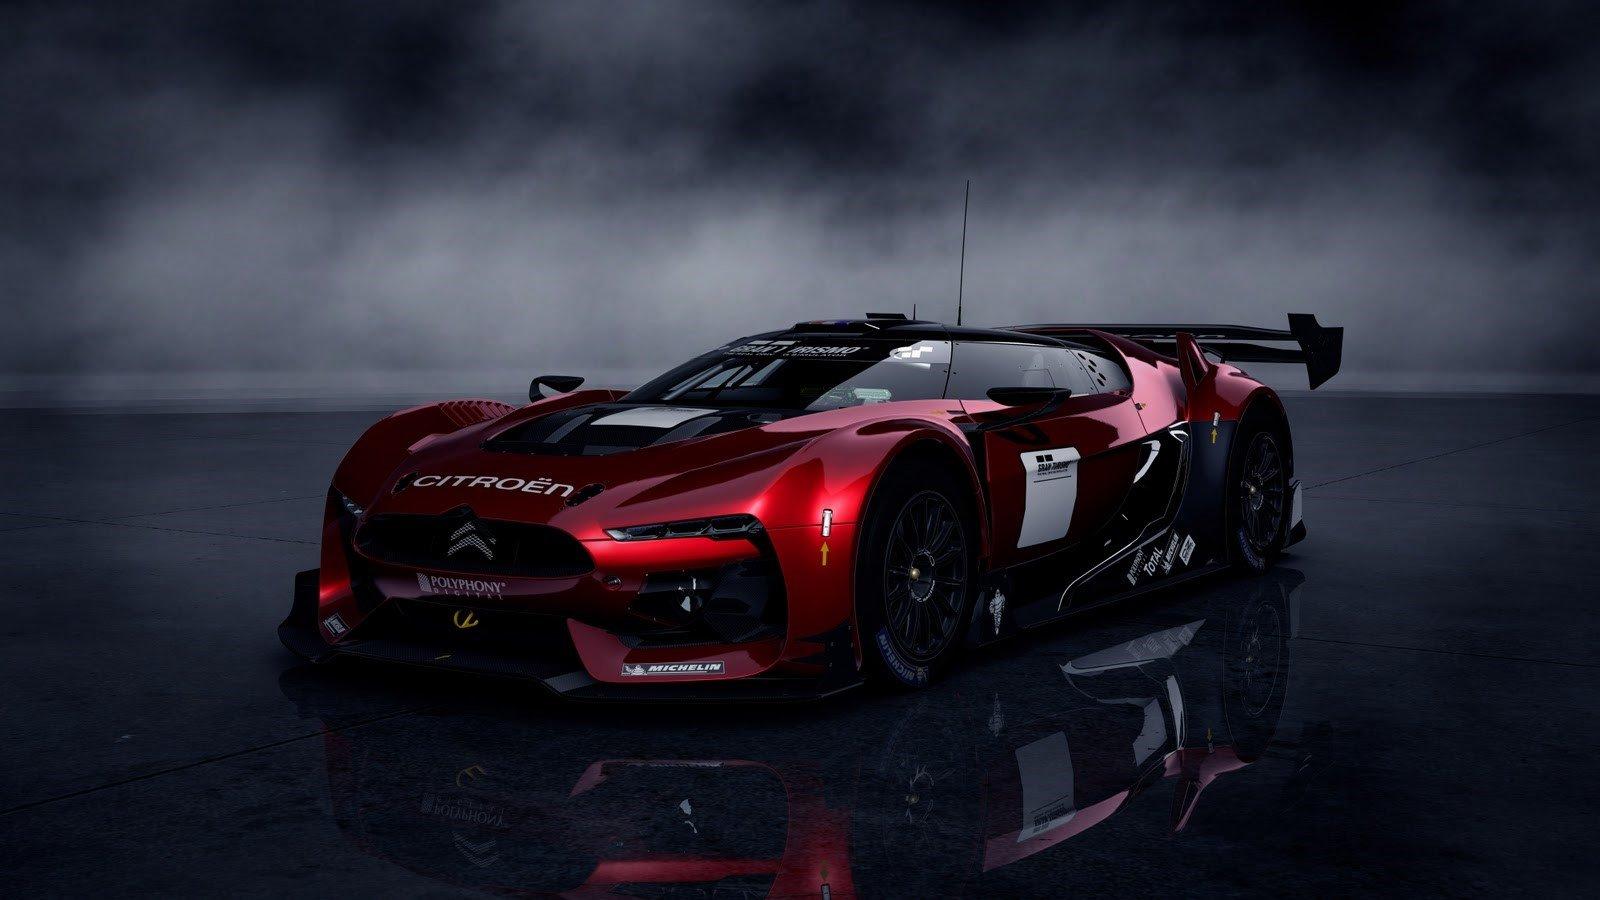 Fondos de pantalla Gran Turismo 5 Citroen GT